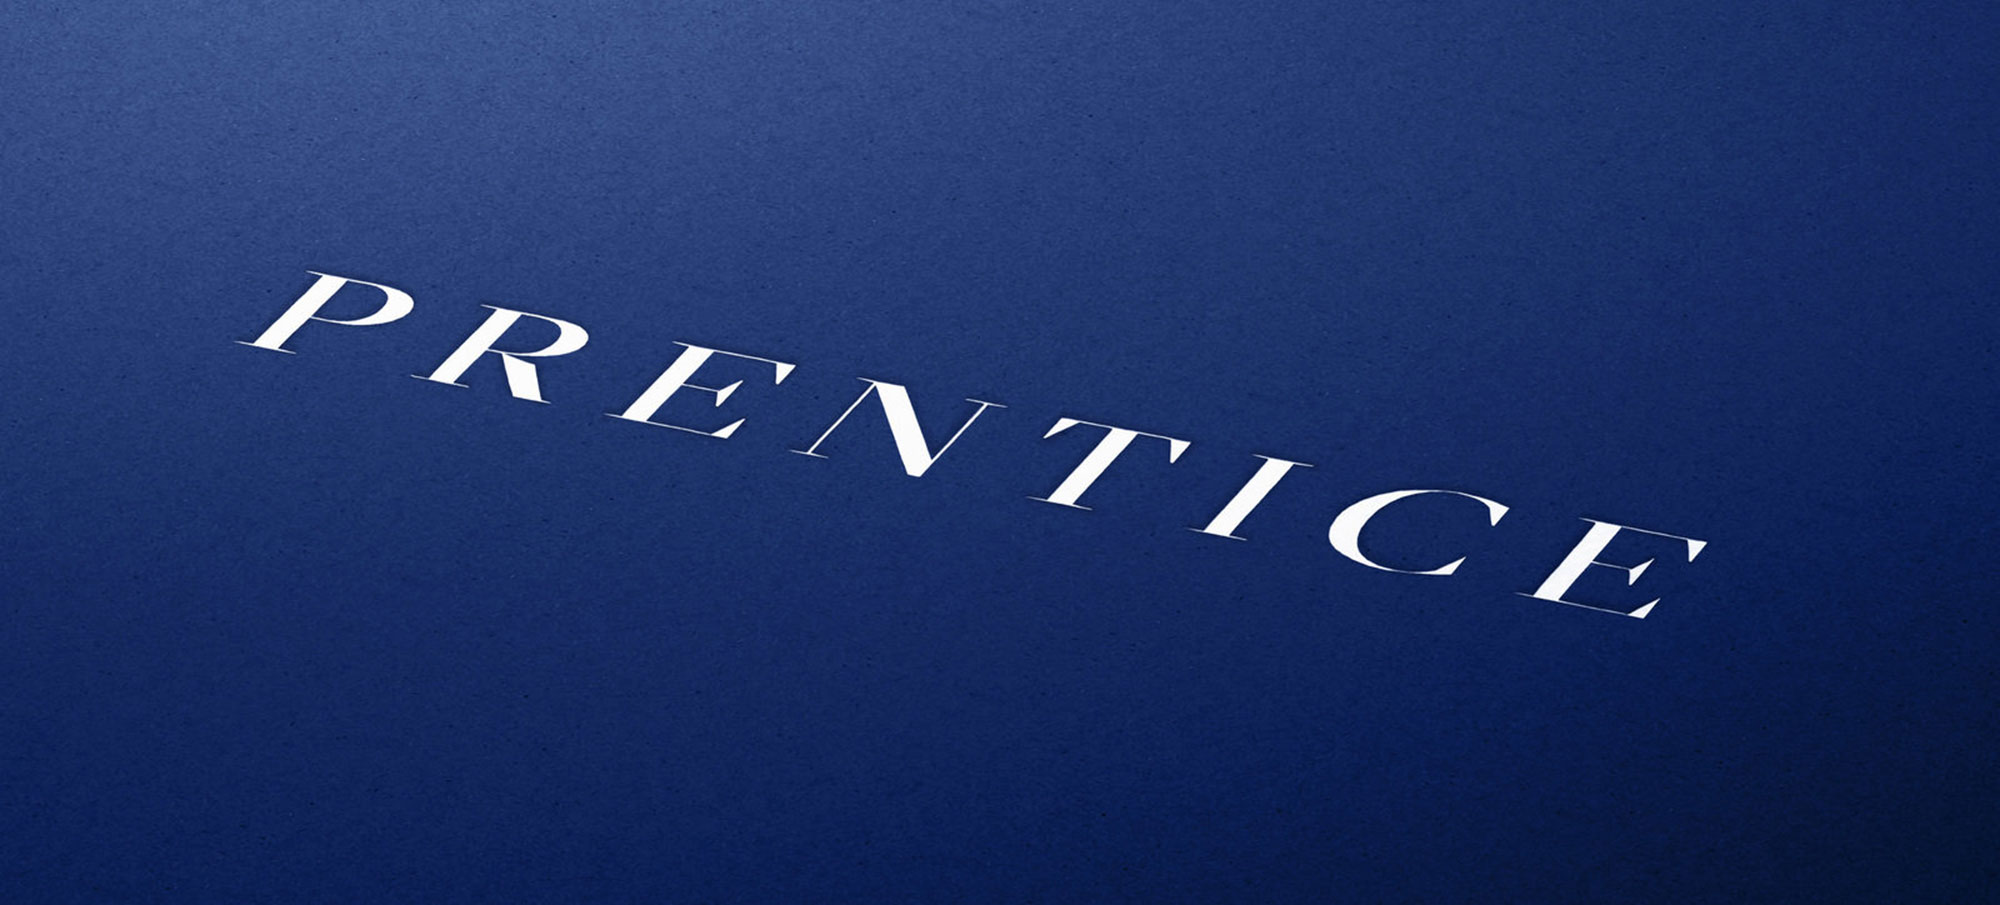 Identity Design for Prentice Cultural Communications